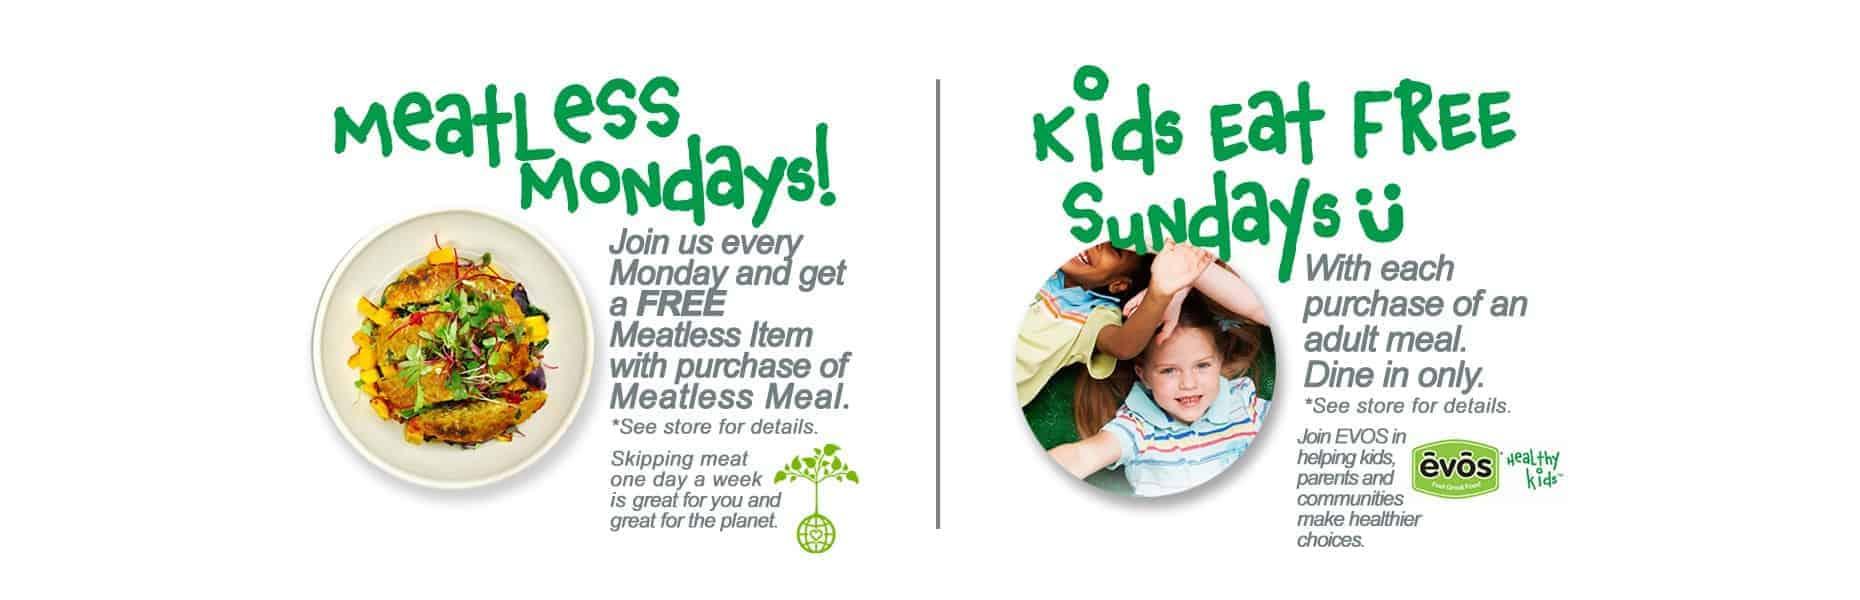 Meatless Monday - Kids Eat Free | EVOS